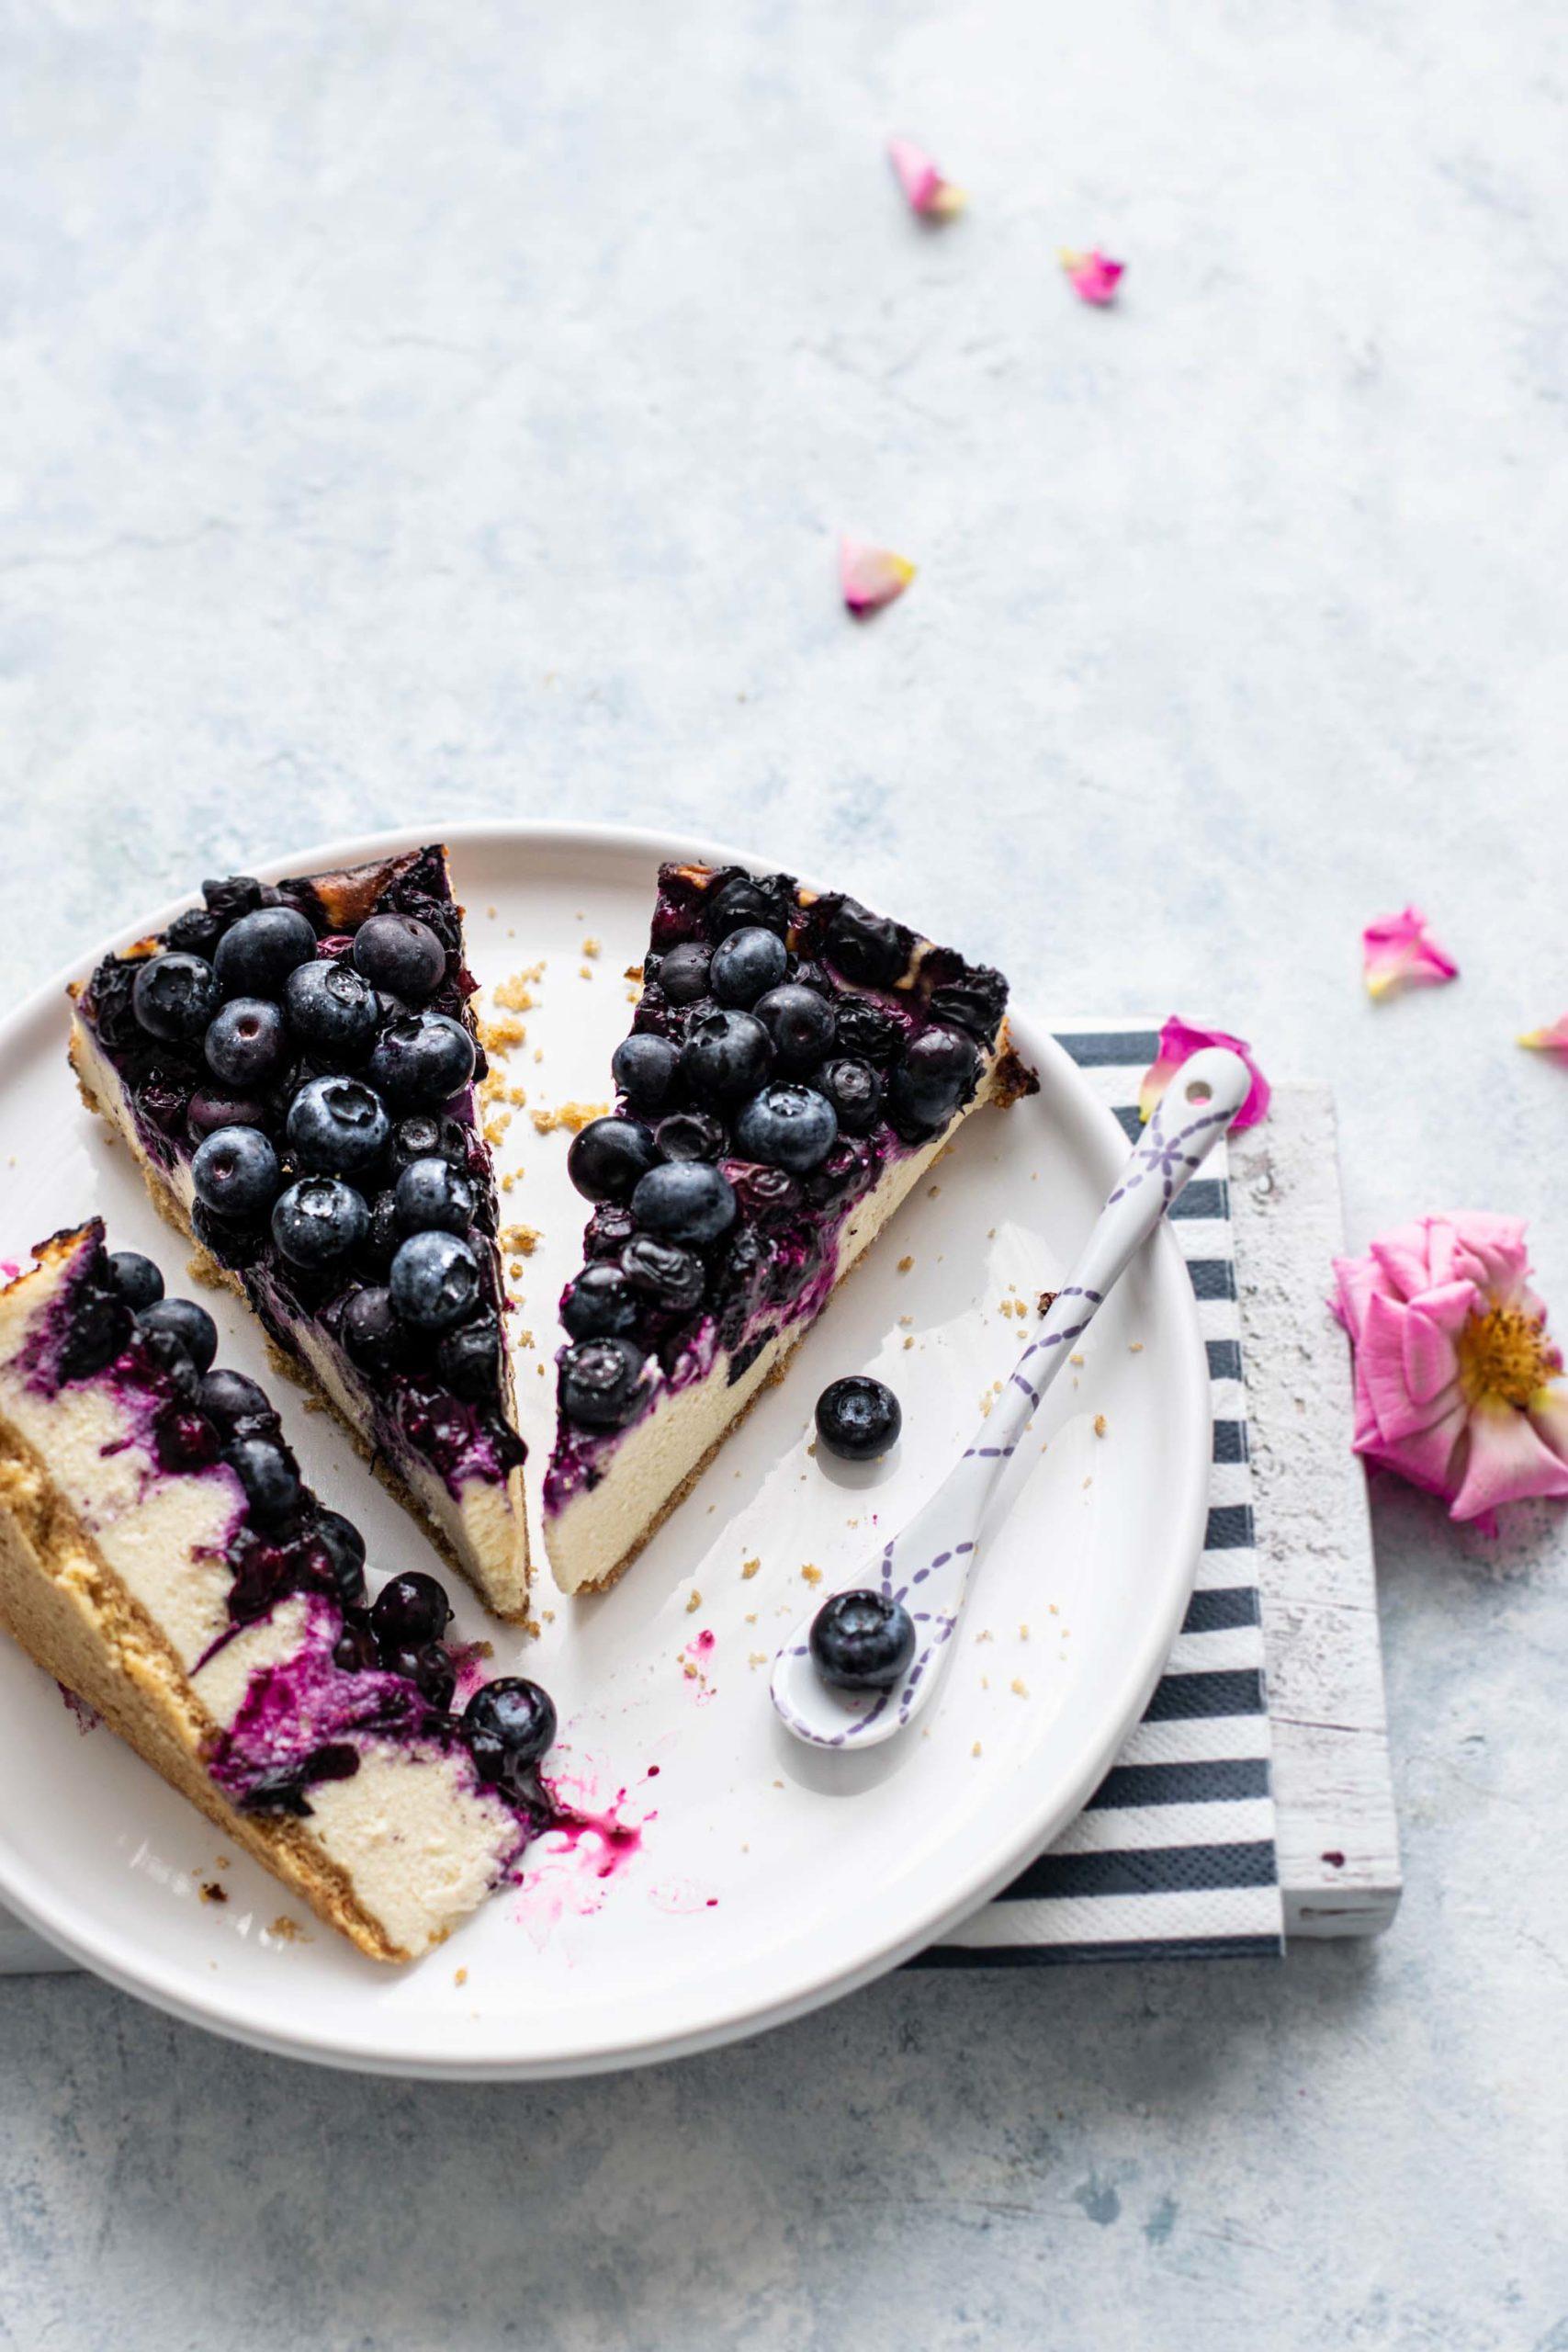 Delicious Blueberry Cheesecake